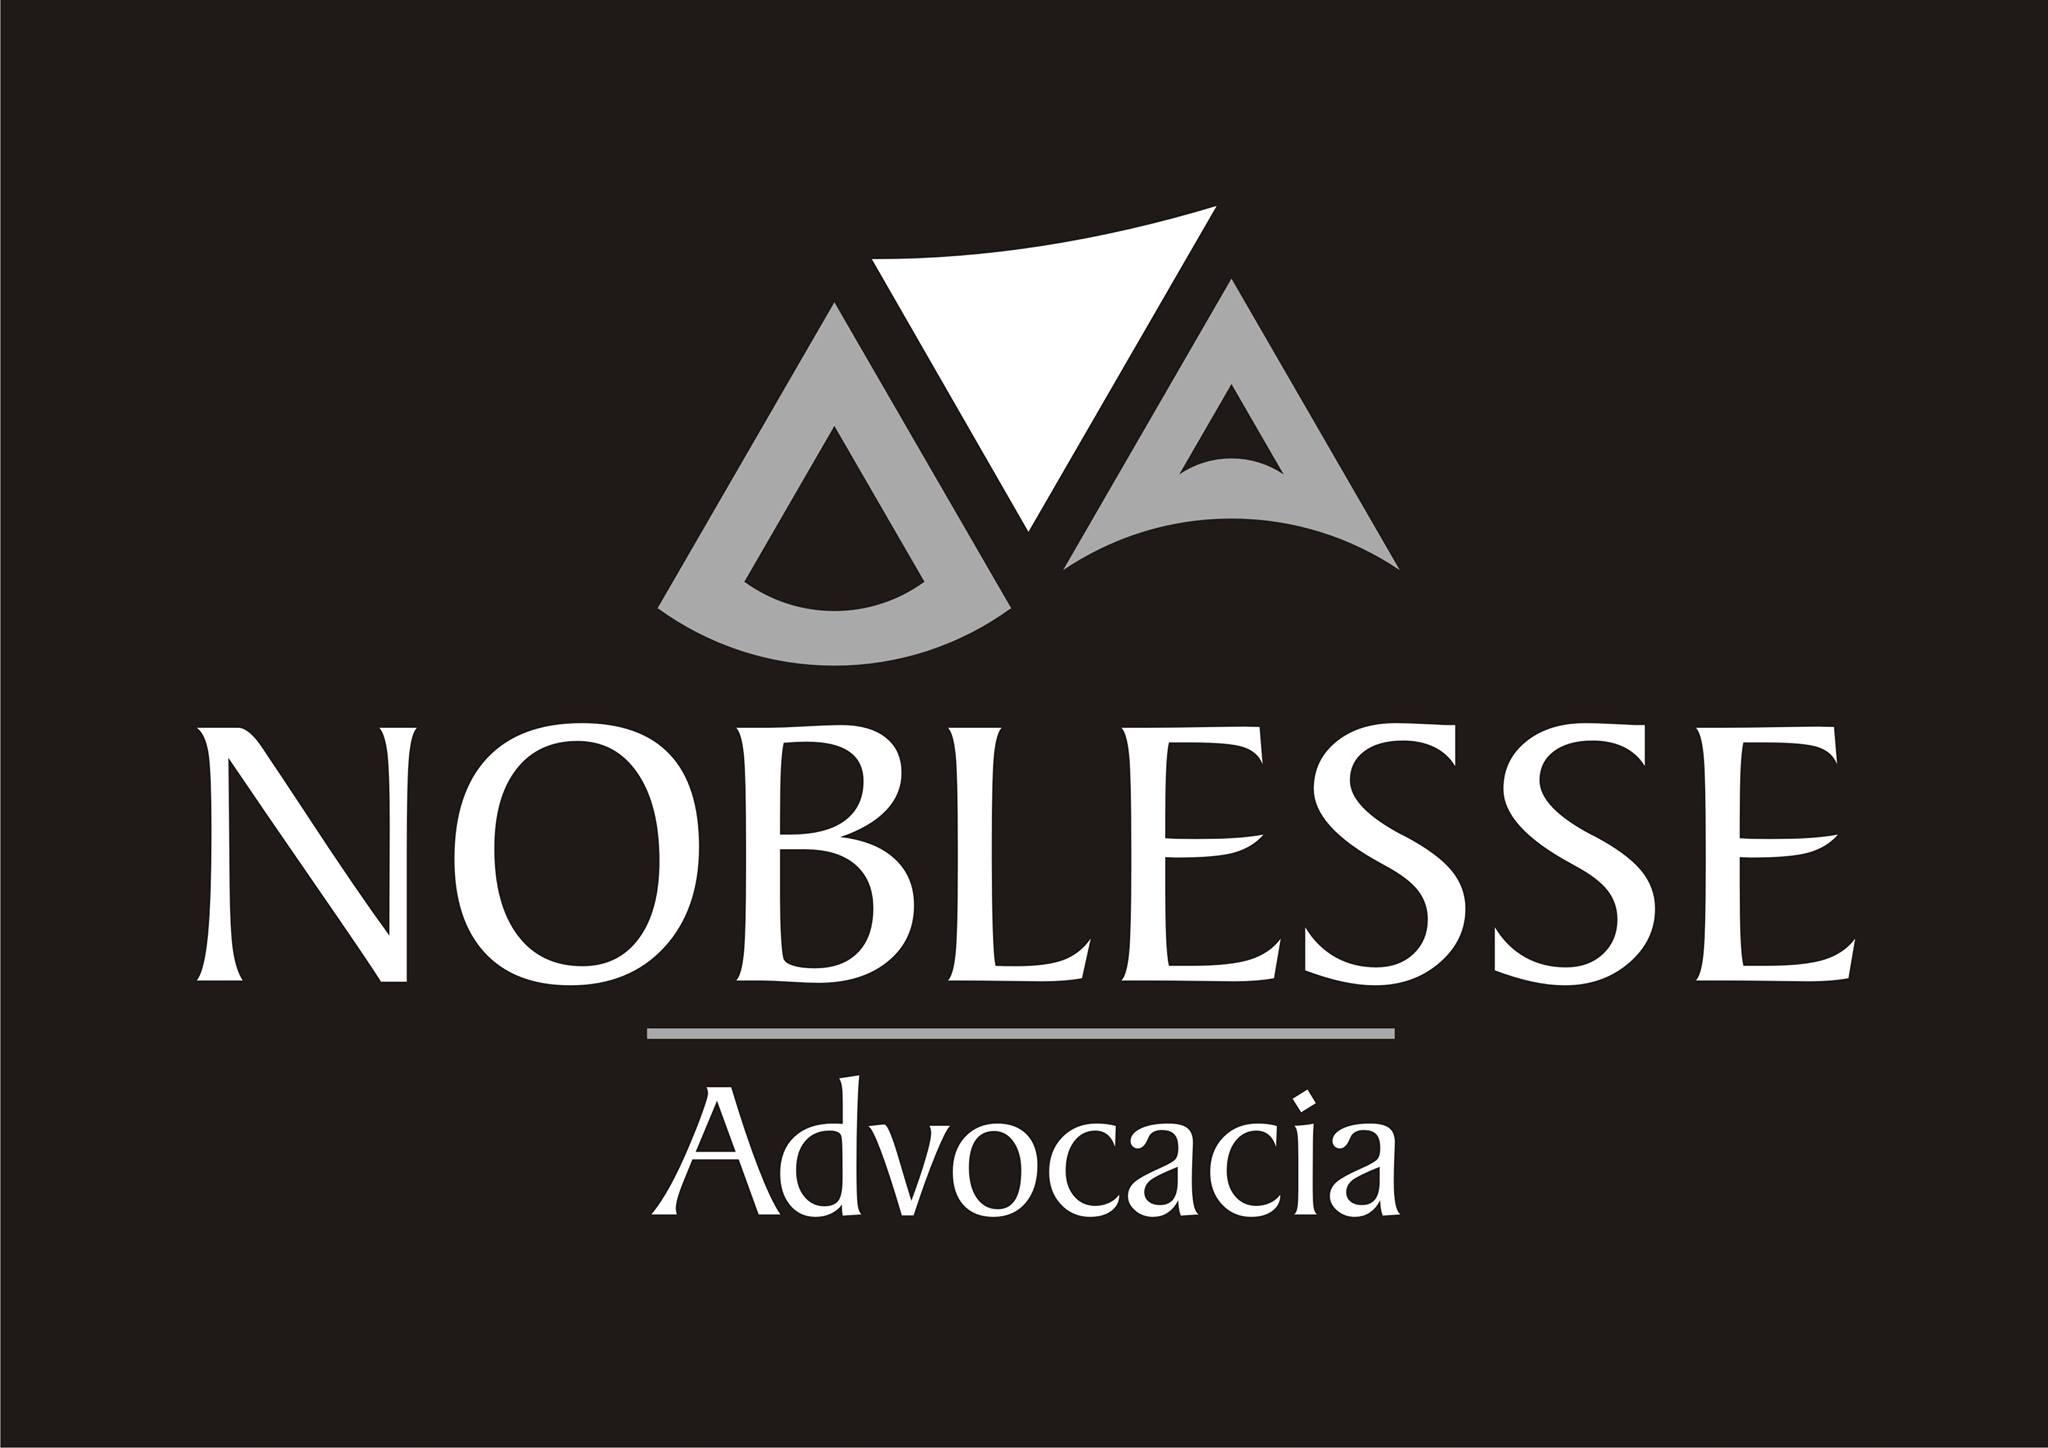 Noblesse Advocacia